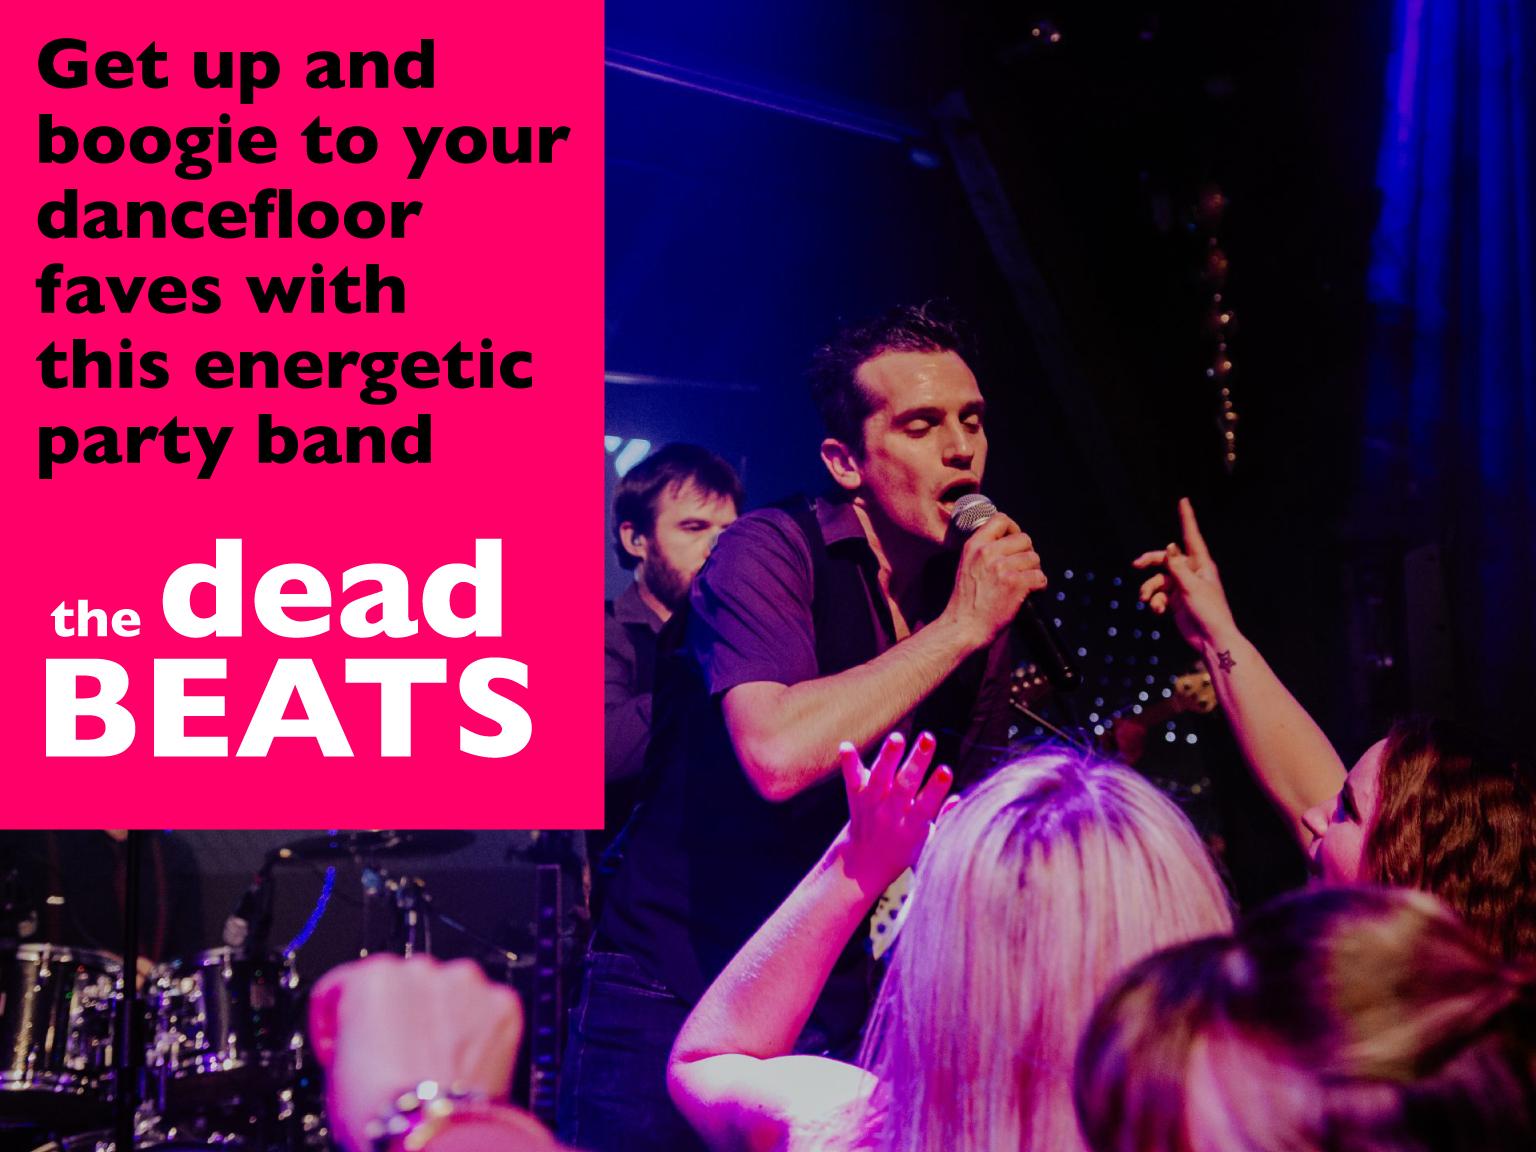 Dead-Beats-promo-graphic